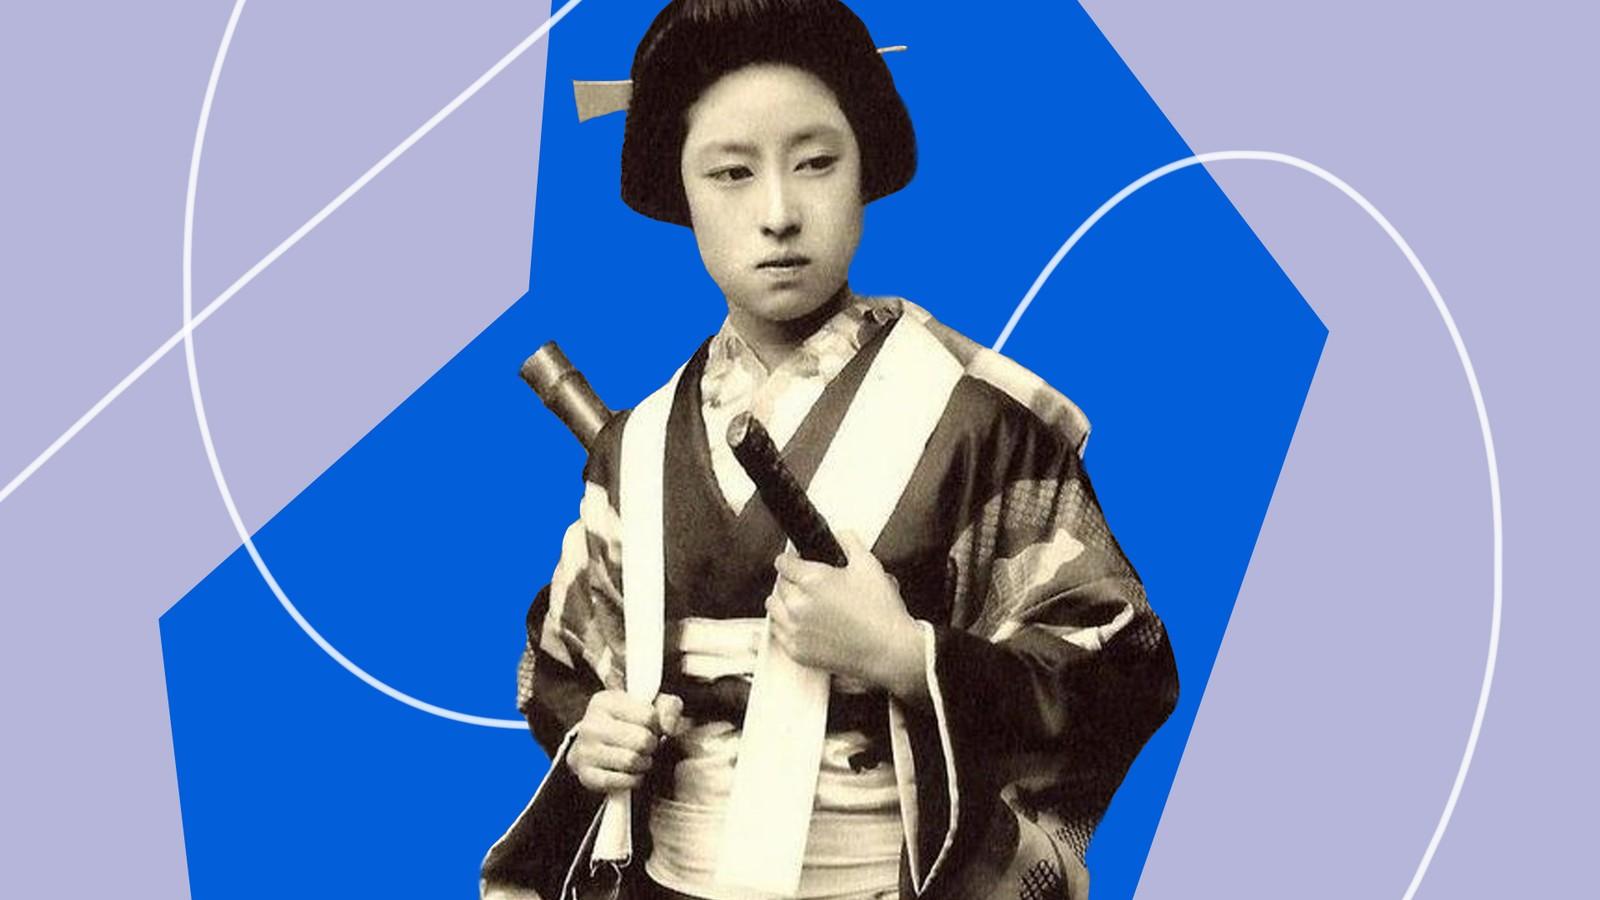 How Onna-Bugeisha, Feudal Japan's Women Samurai, Were Erased From History